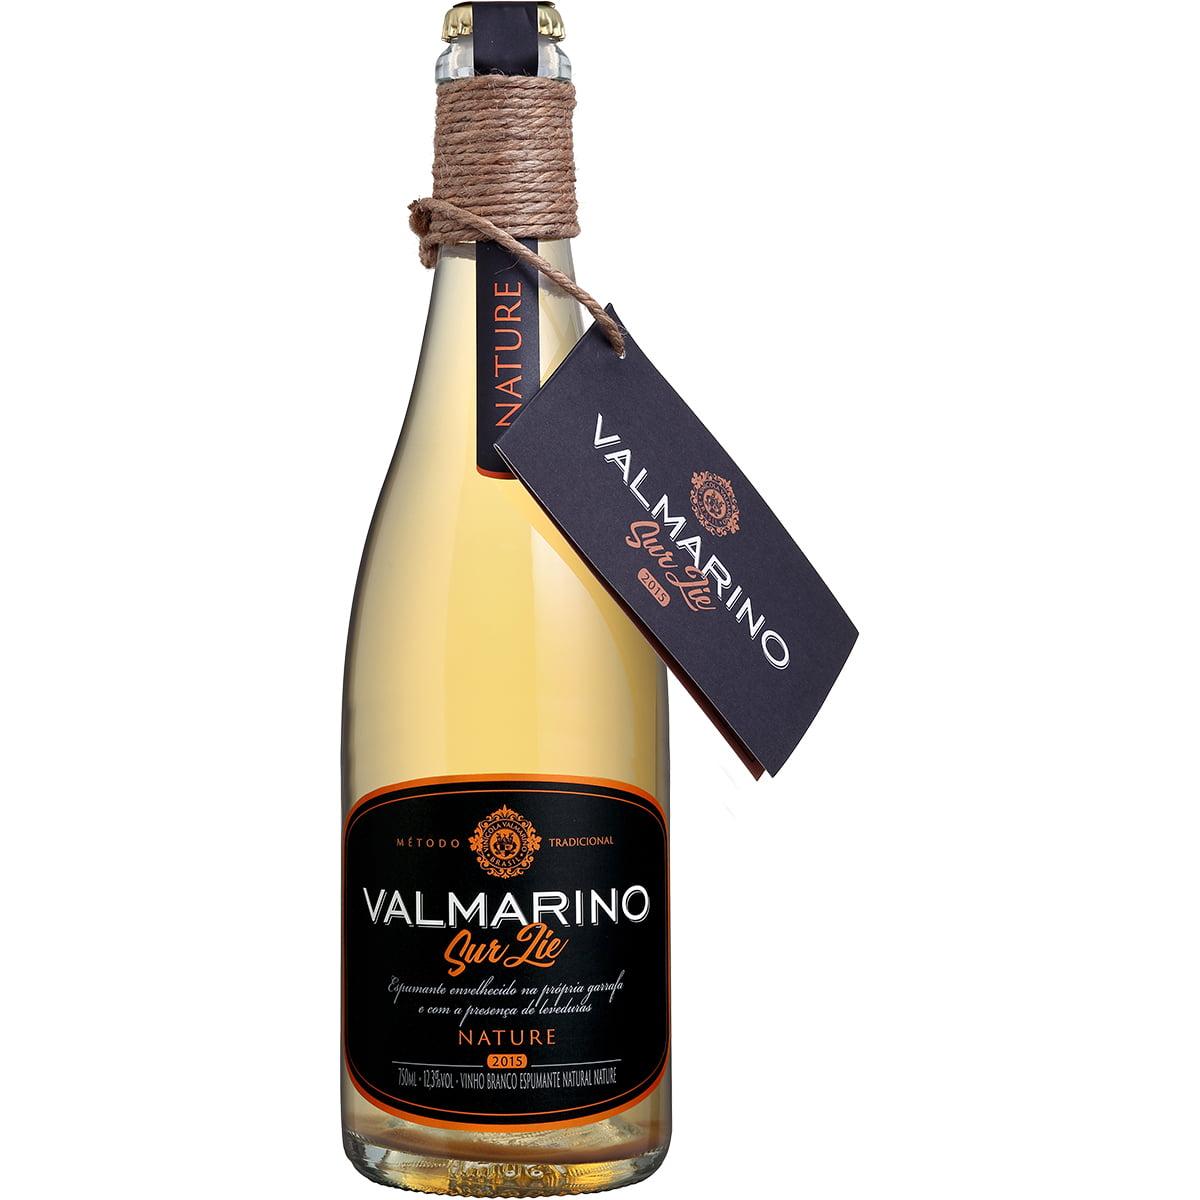 Espumante Valmarino Nature  Sur Lie 750ml